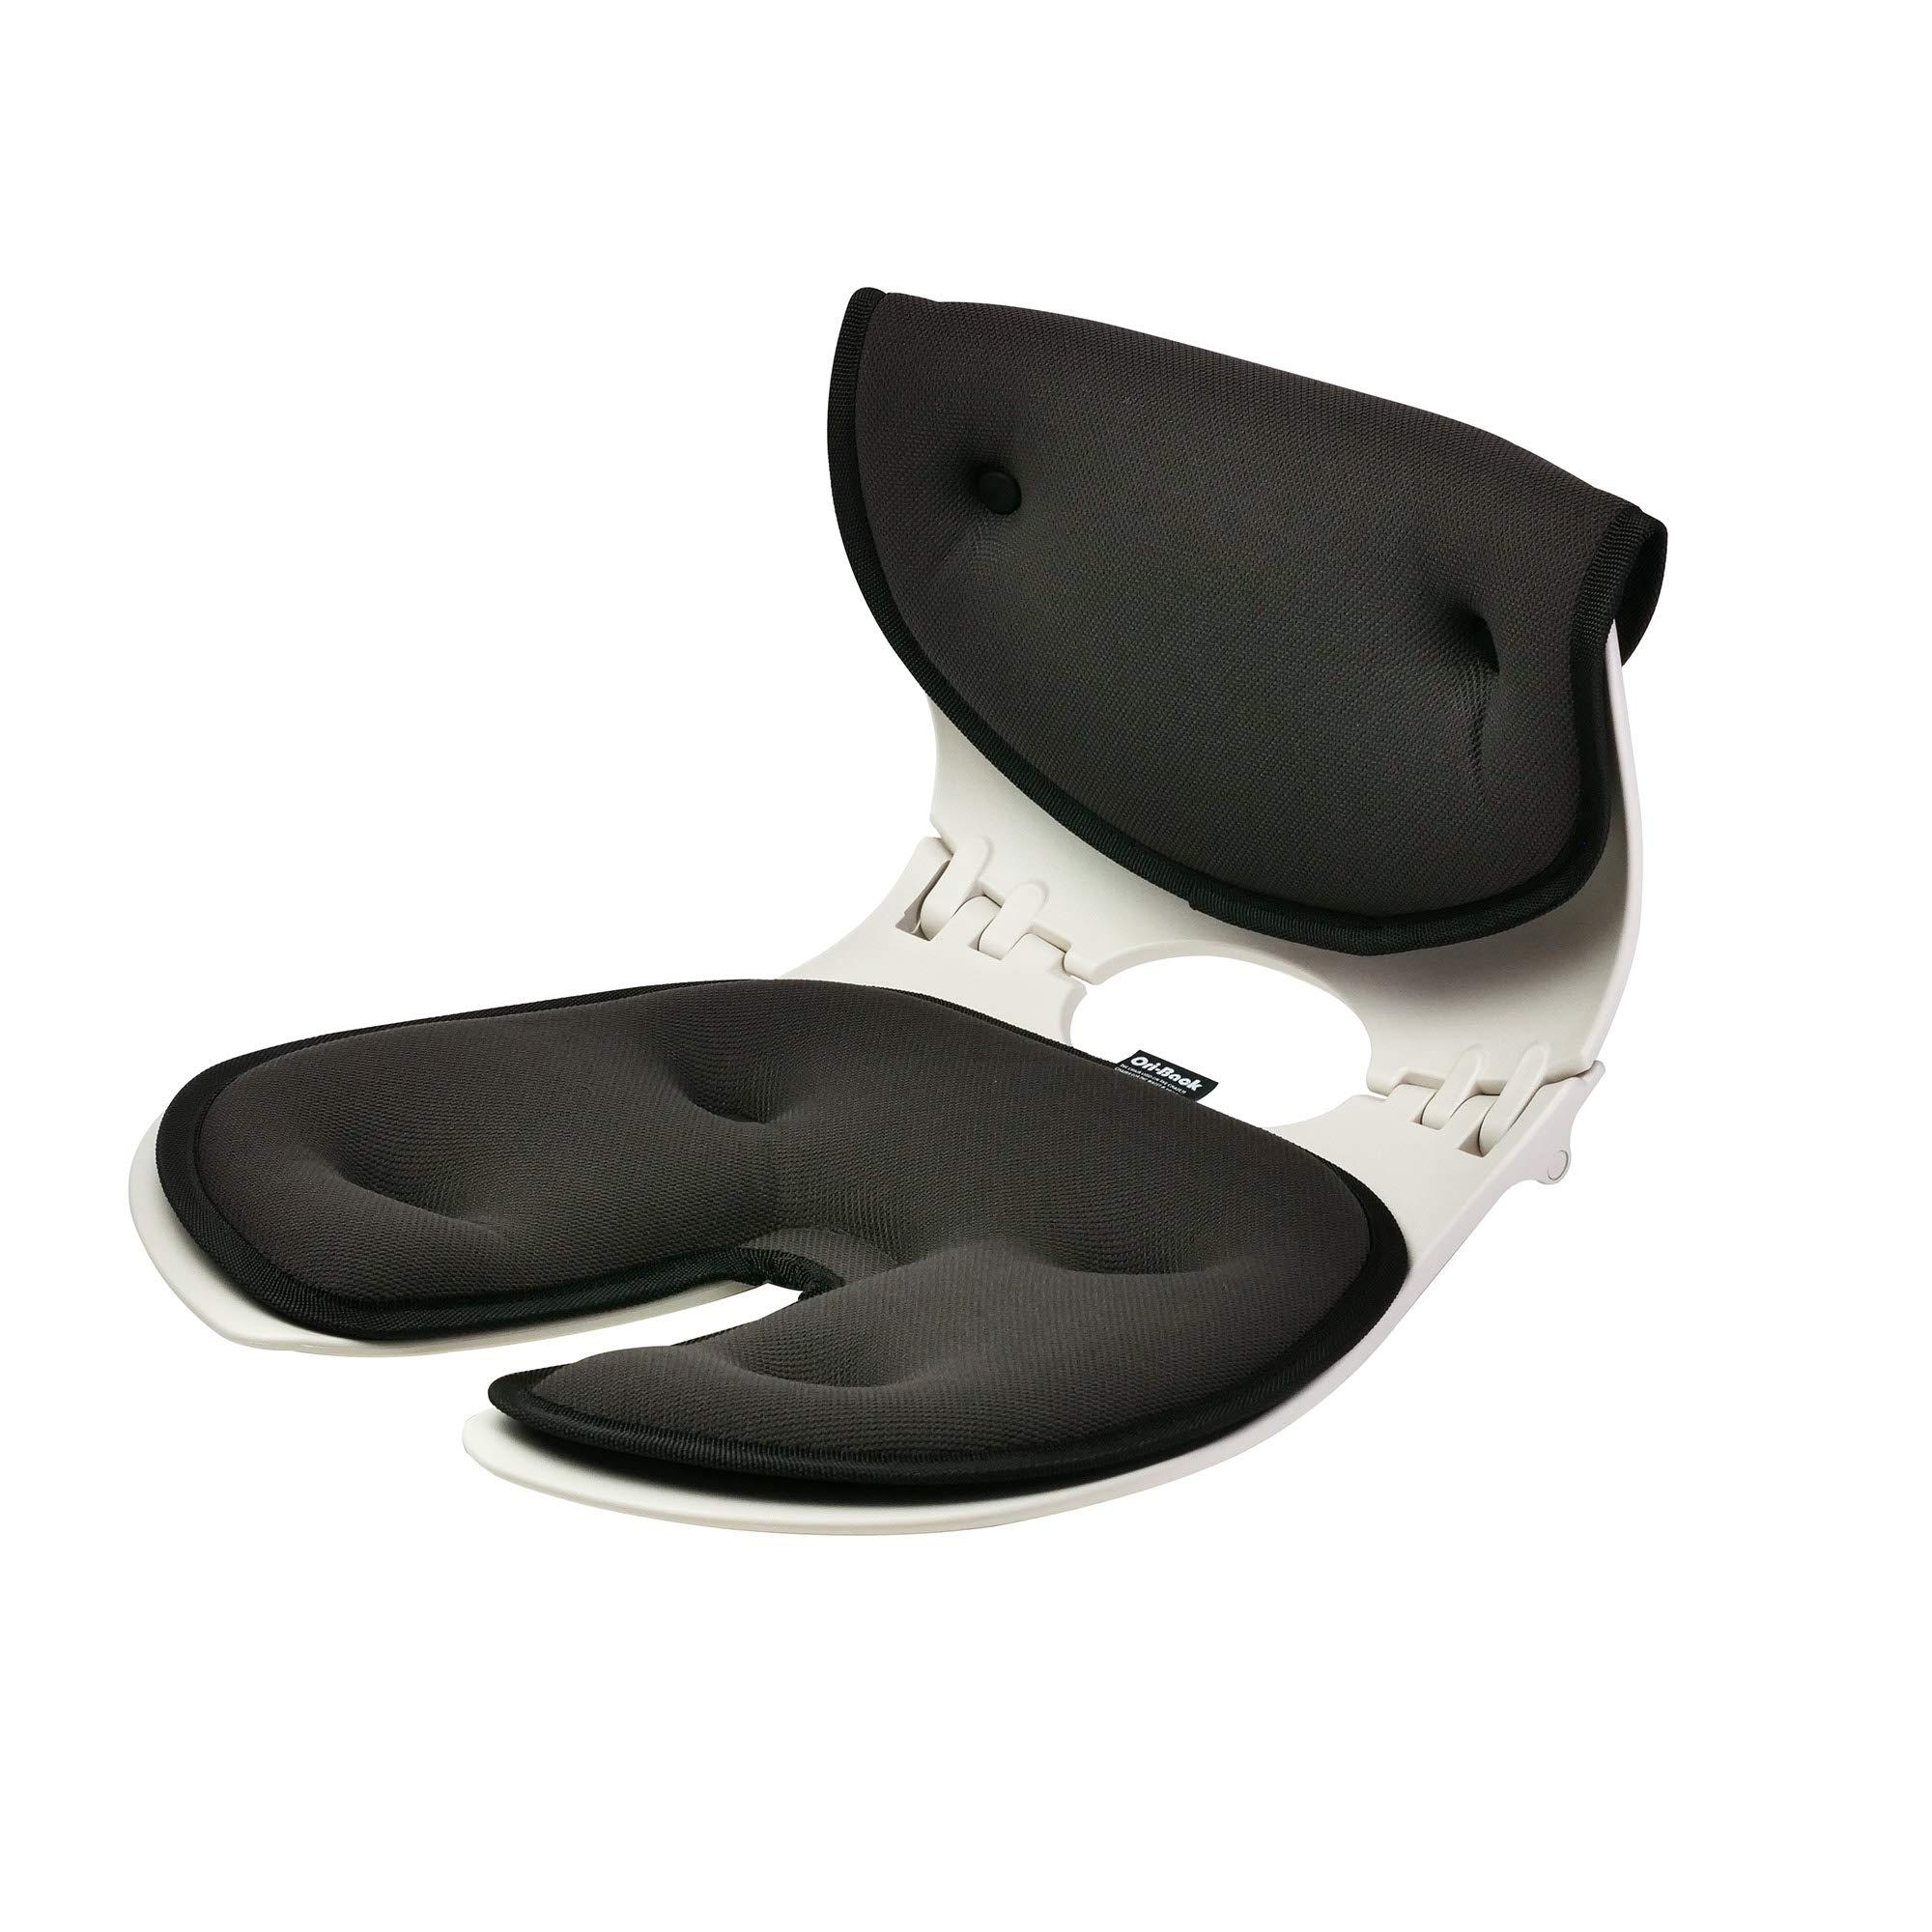 Ori-Back COC Basic Ergonomic Portable Chair (Chocolate) by Ori-Back